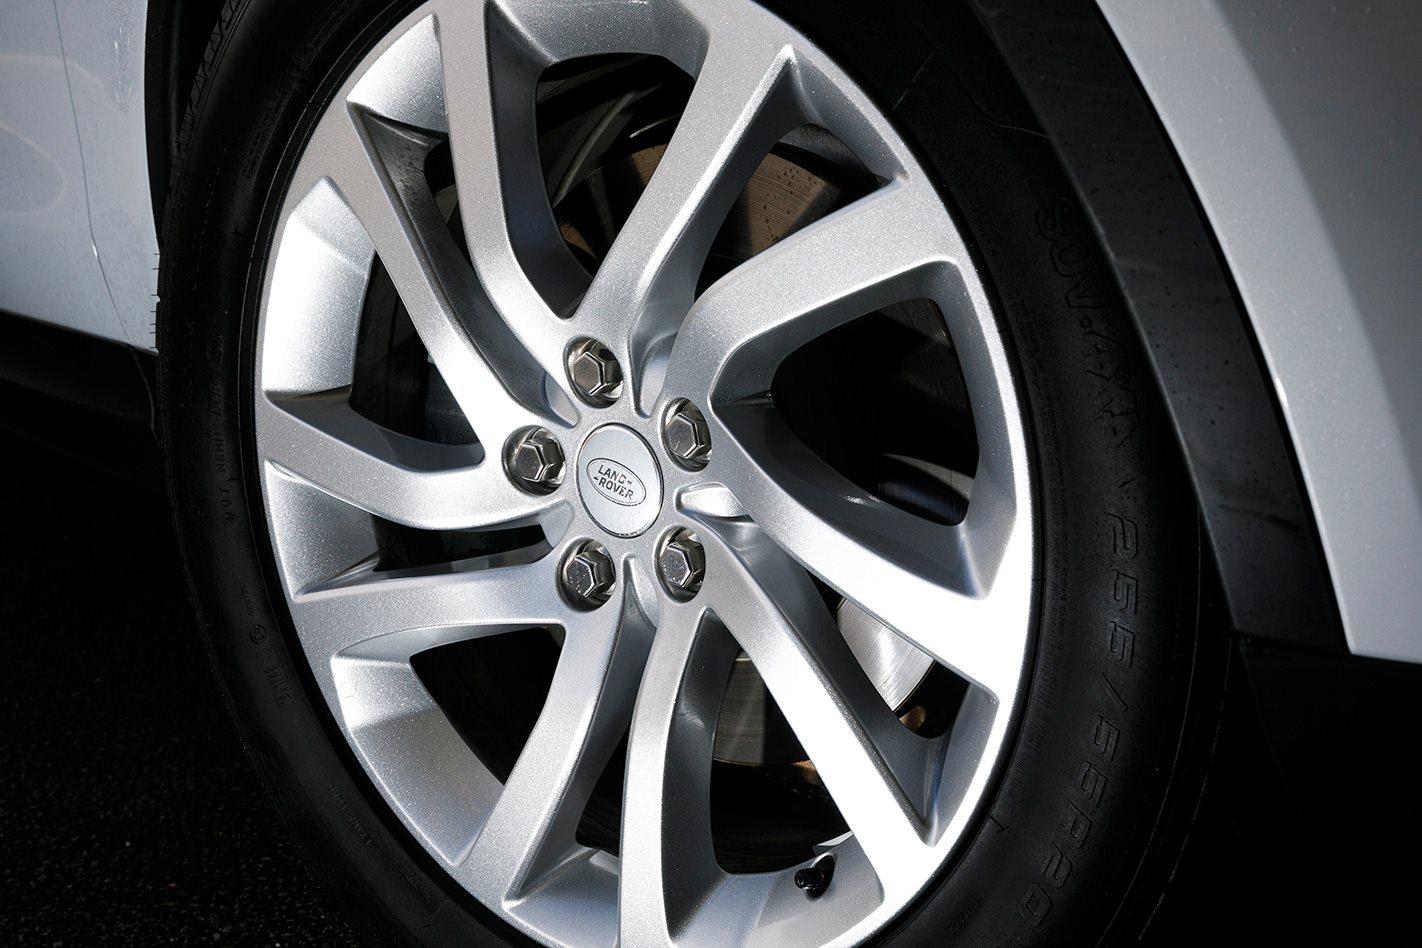 2017 Land Rover Discovery wheel.jpg